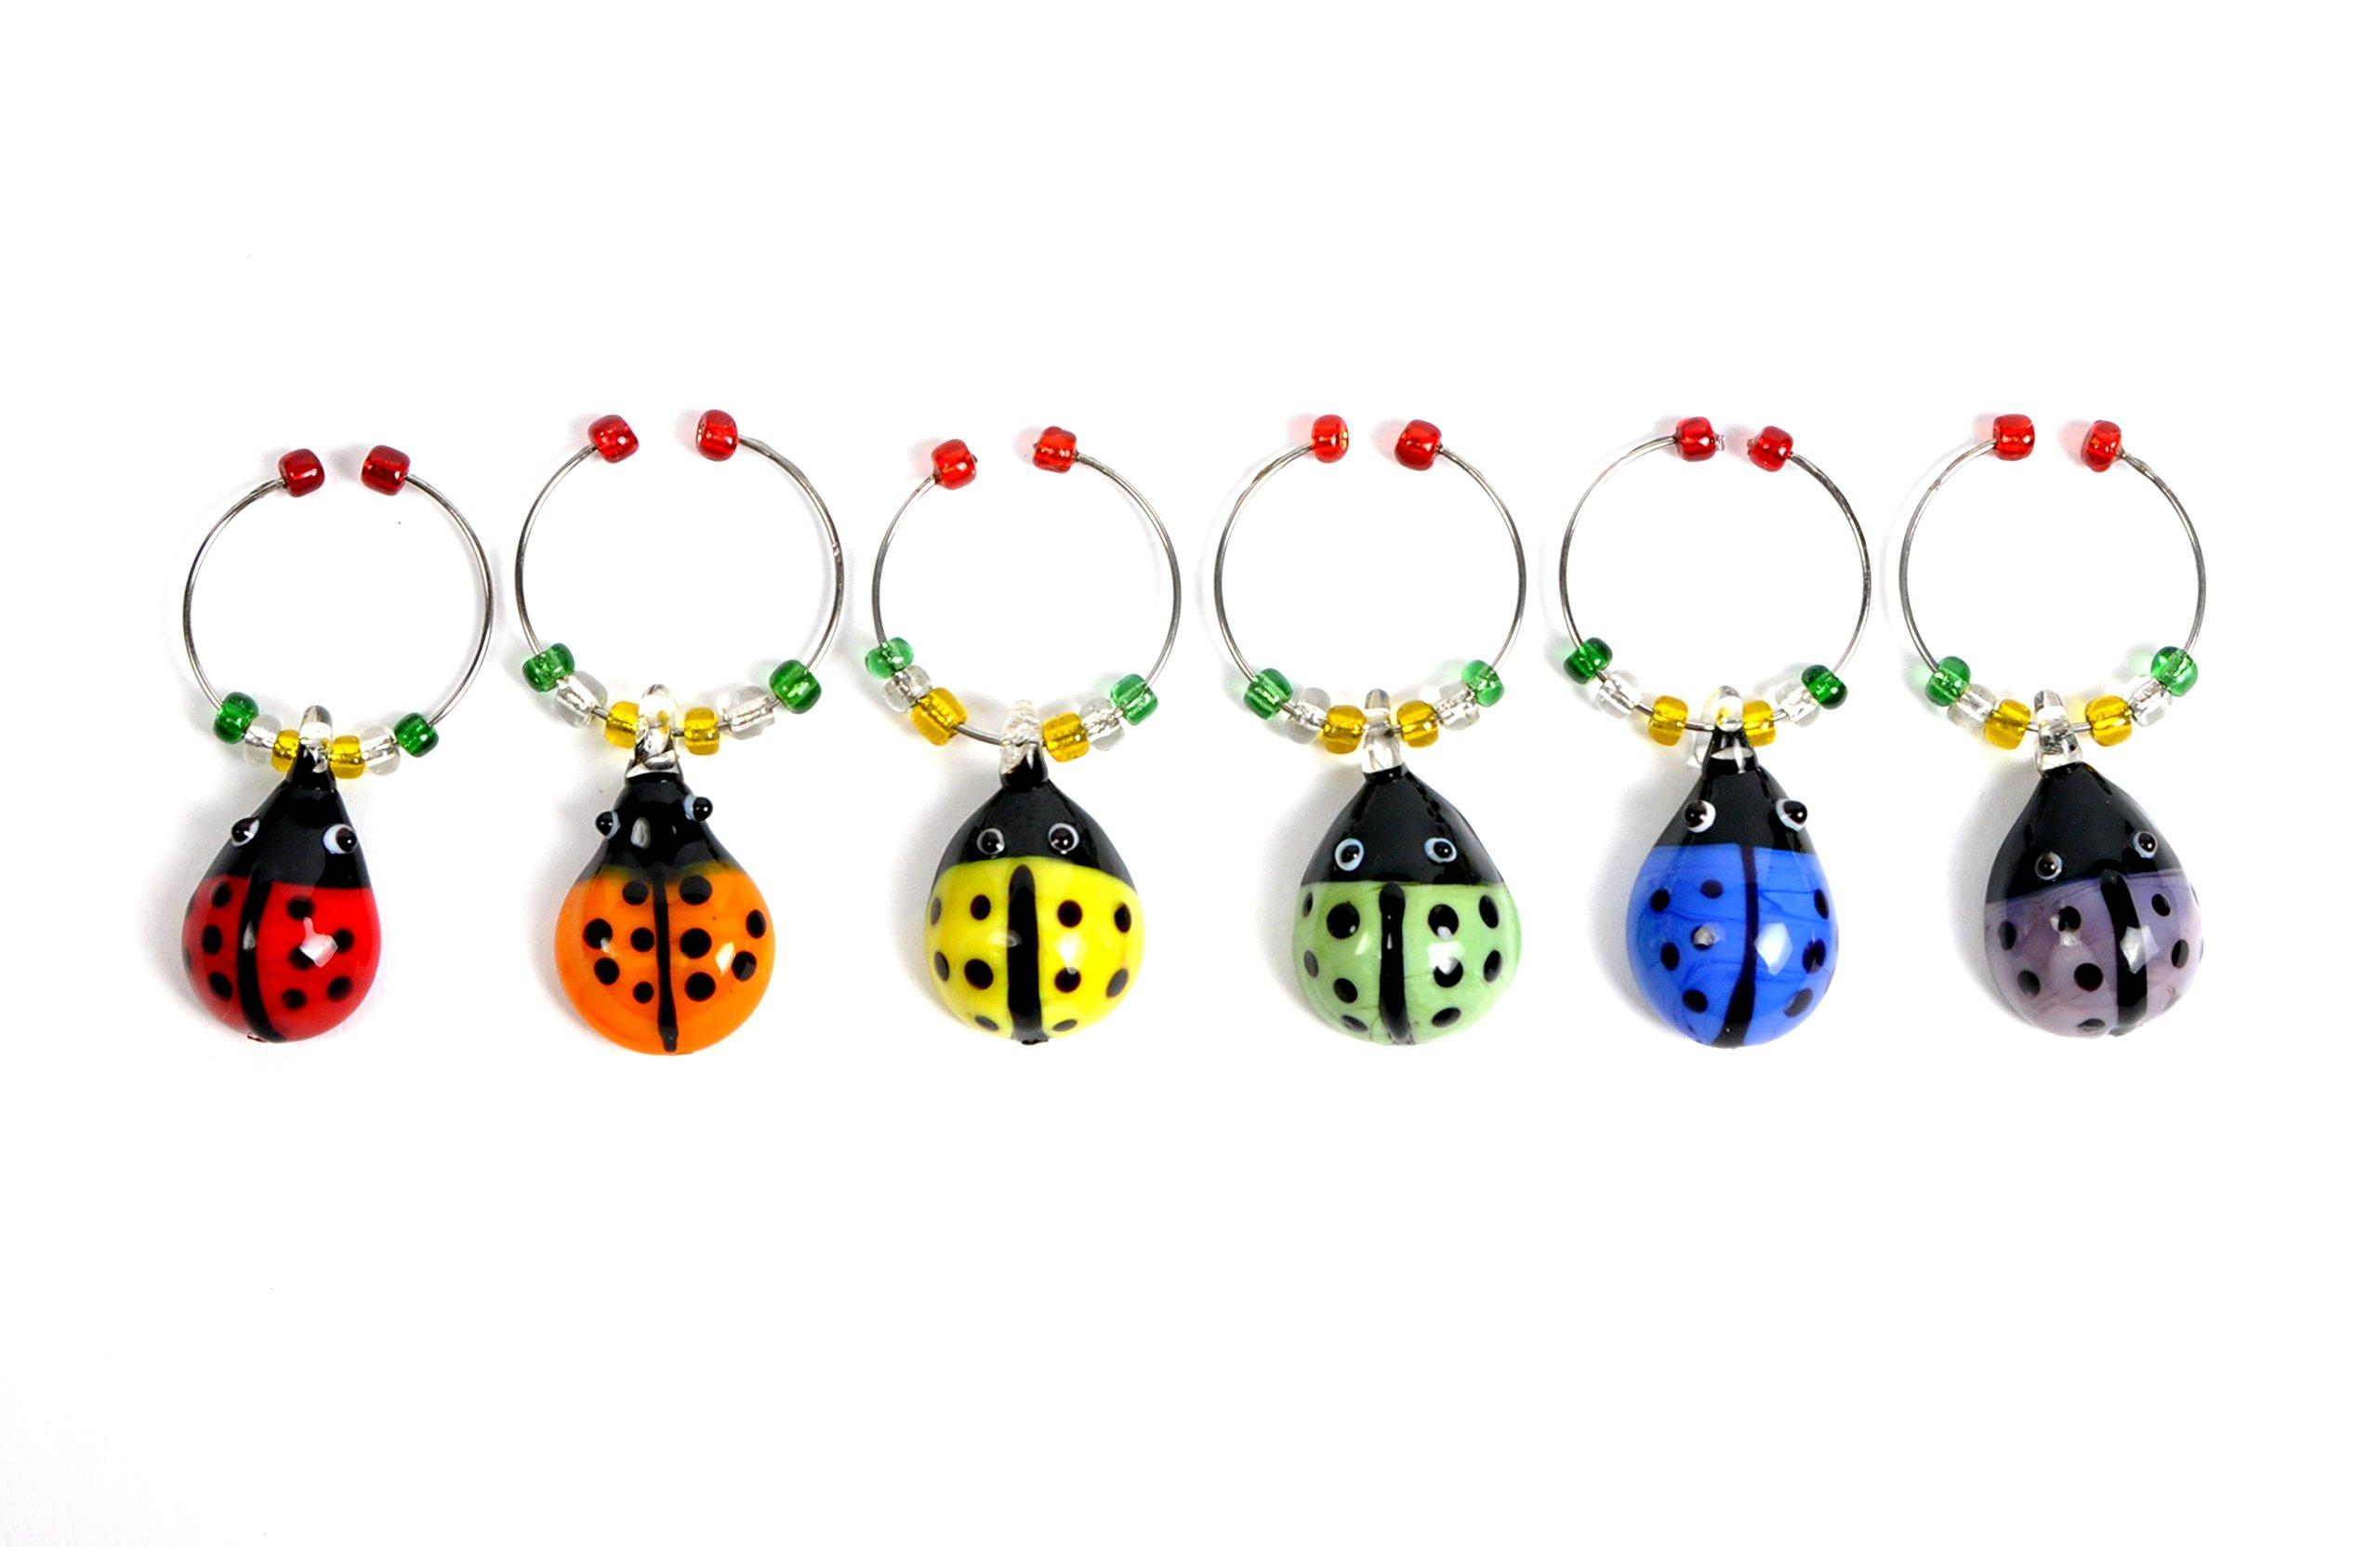 Cork & Leaf  Glass LadyBug Wine Glass Charms, Hand Painted Glass - Set of 6 with Sateen Storage Bag